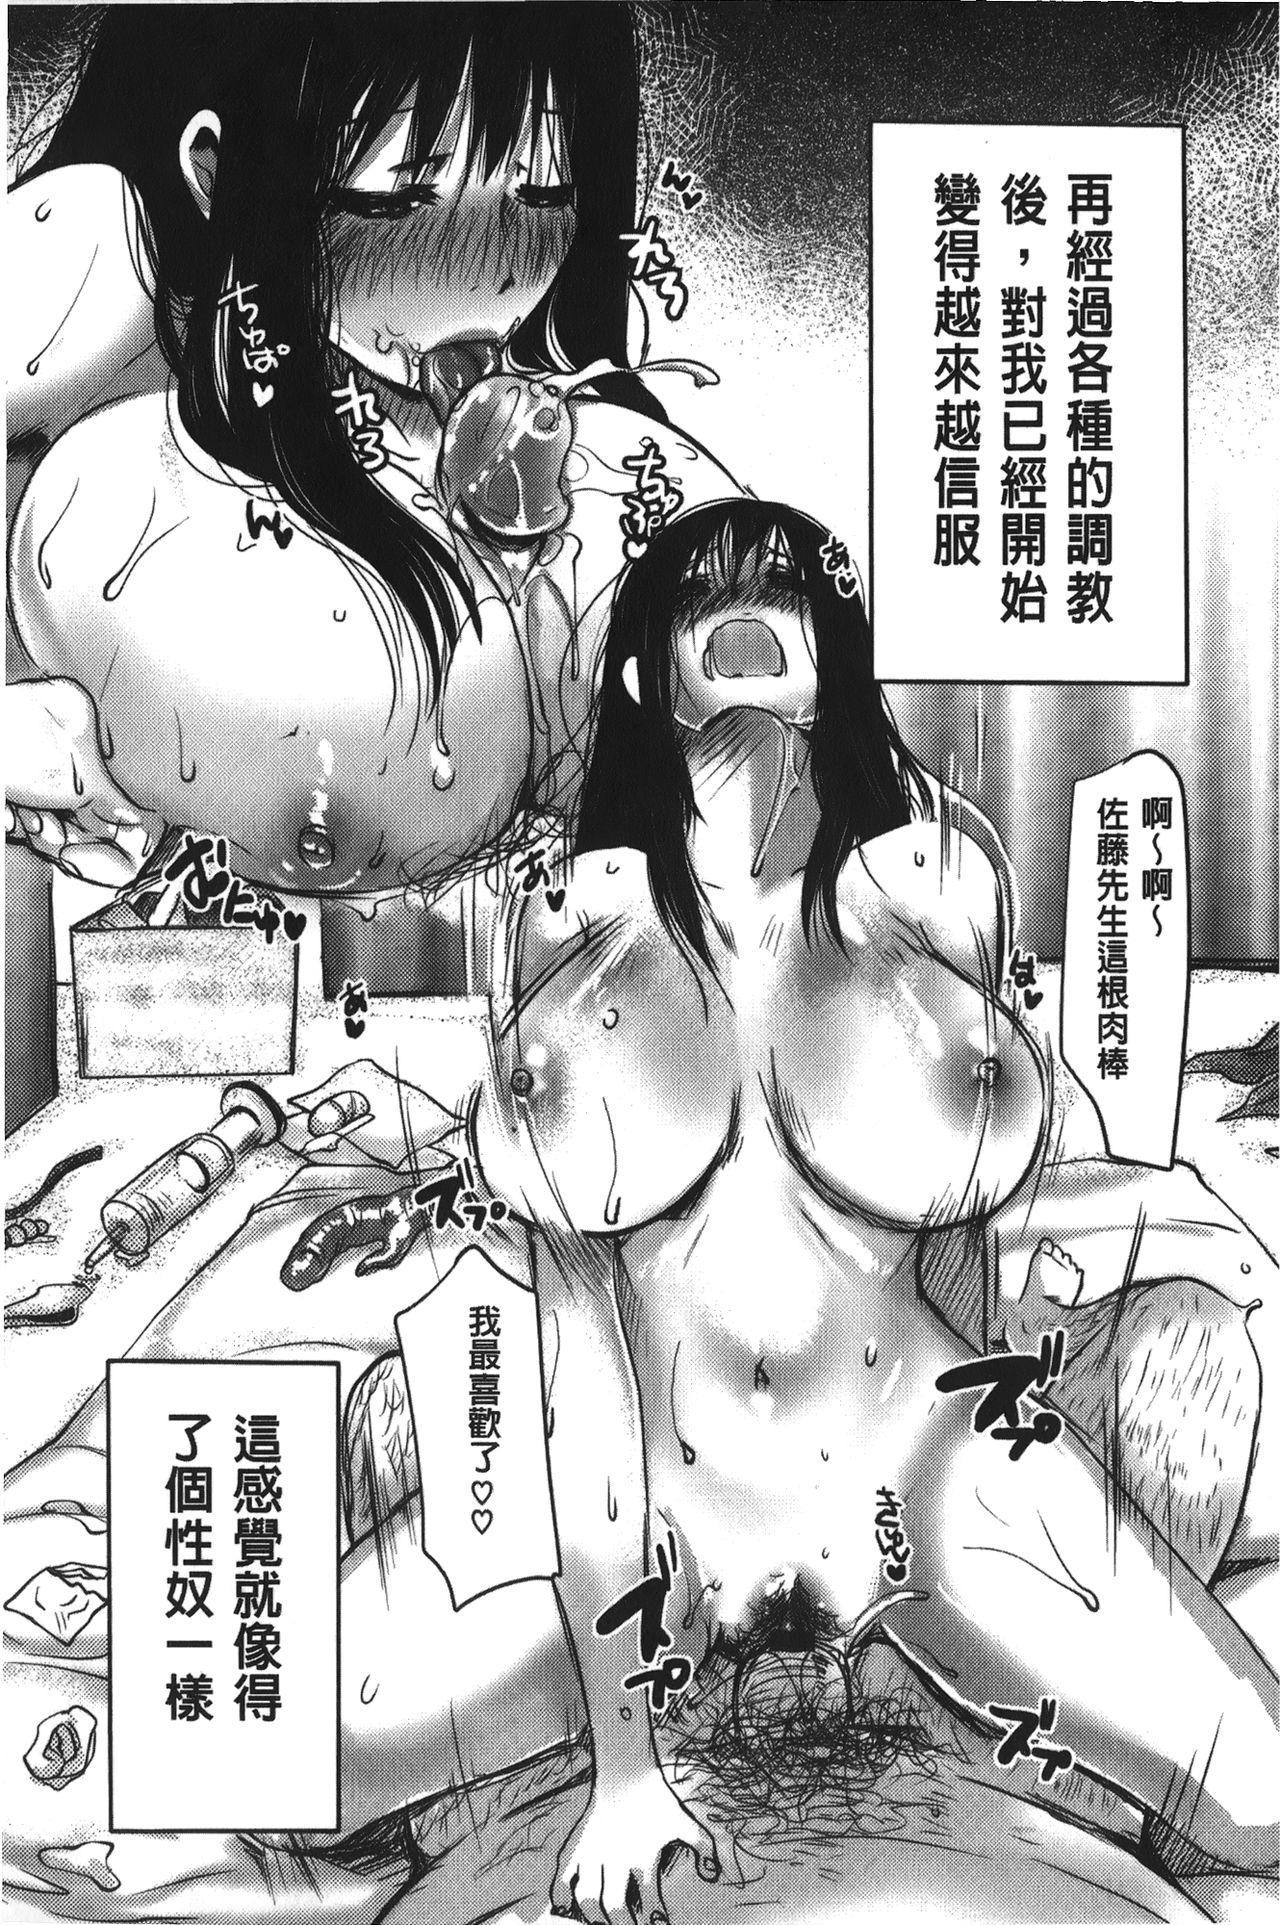 Kanjuku Torozuma 166